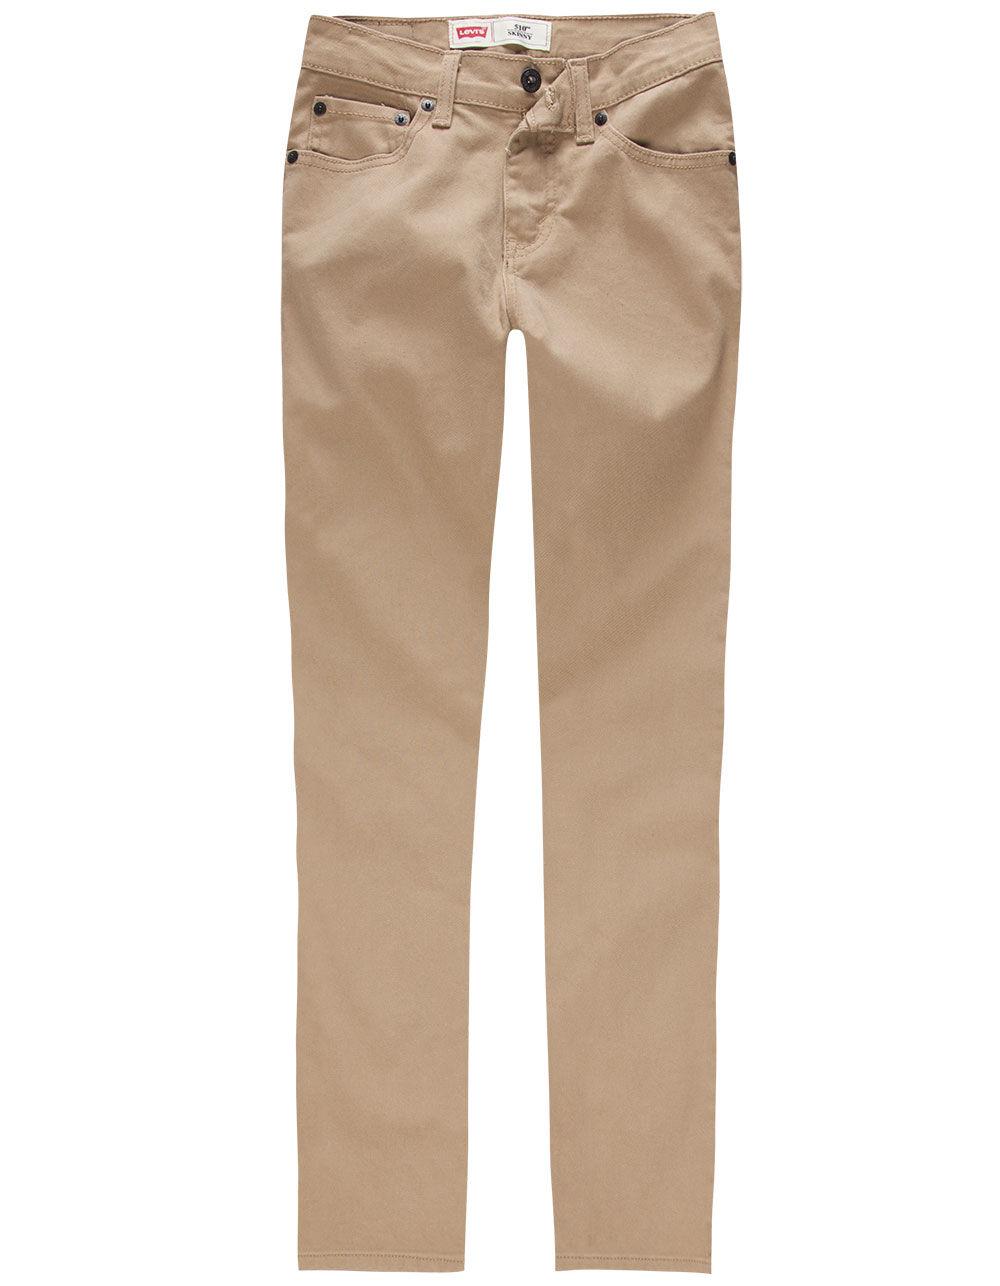 LEVI'S 510 British Khaki Boys Skinny Jeans